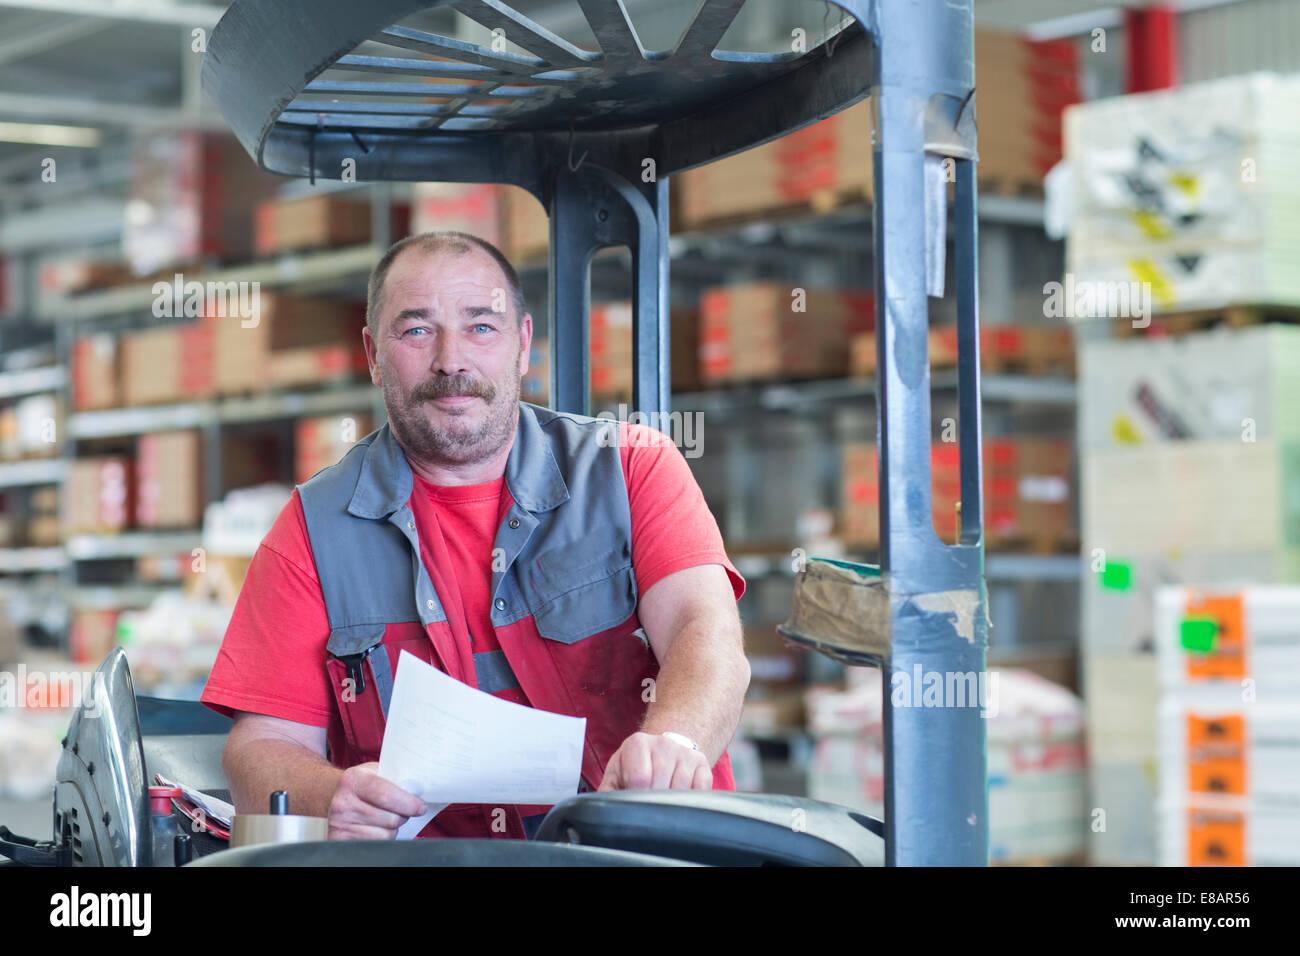 Porträt von Gabelstapler LKW-Fahrer im Baumarkt warehouse Stockbild